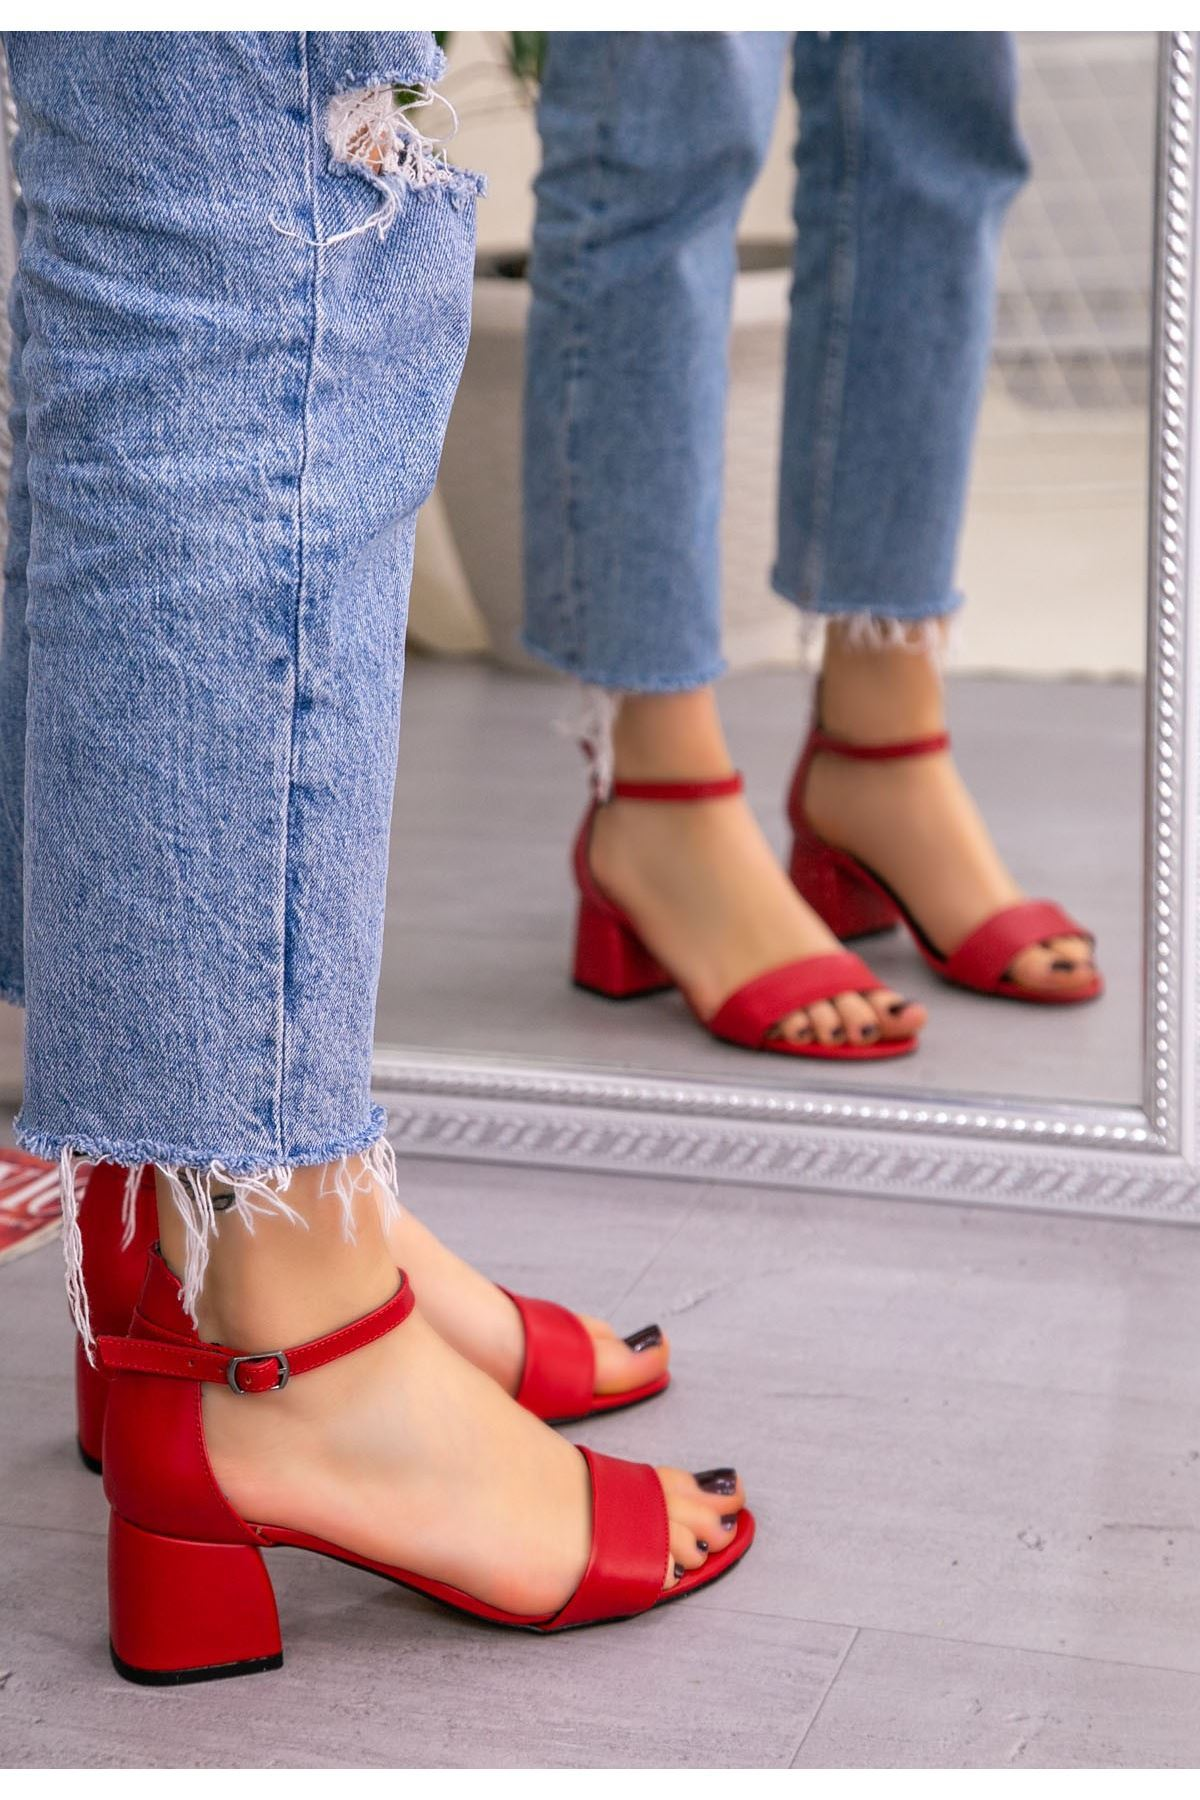 Epon Kırmız Cilt Tek Bant Topuklu Ayakkabı